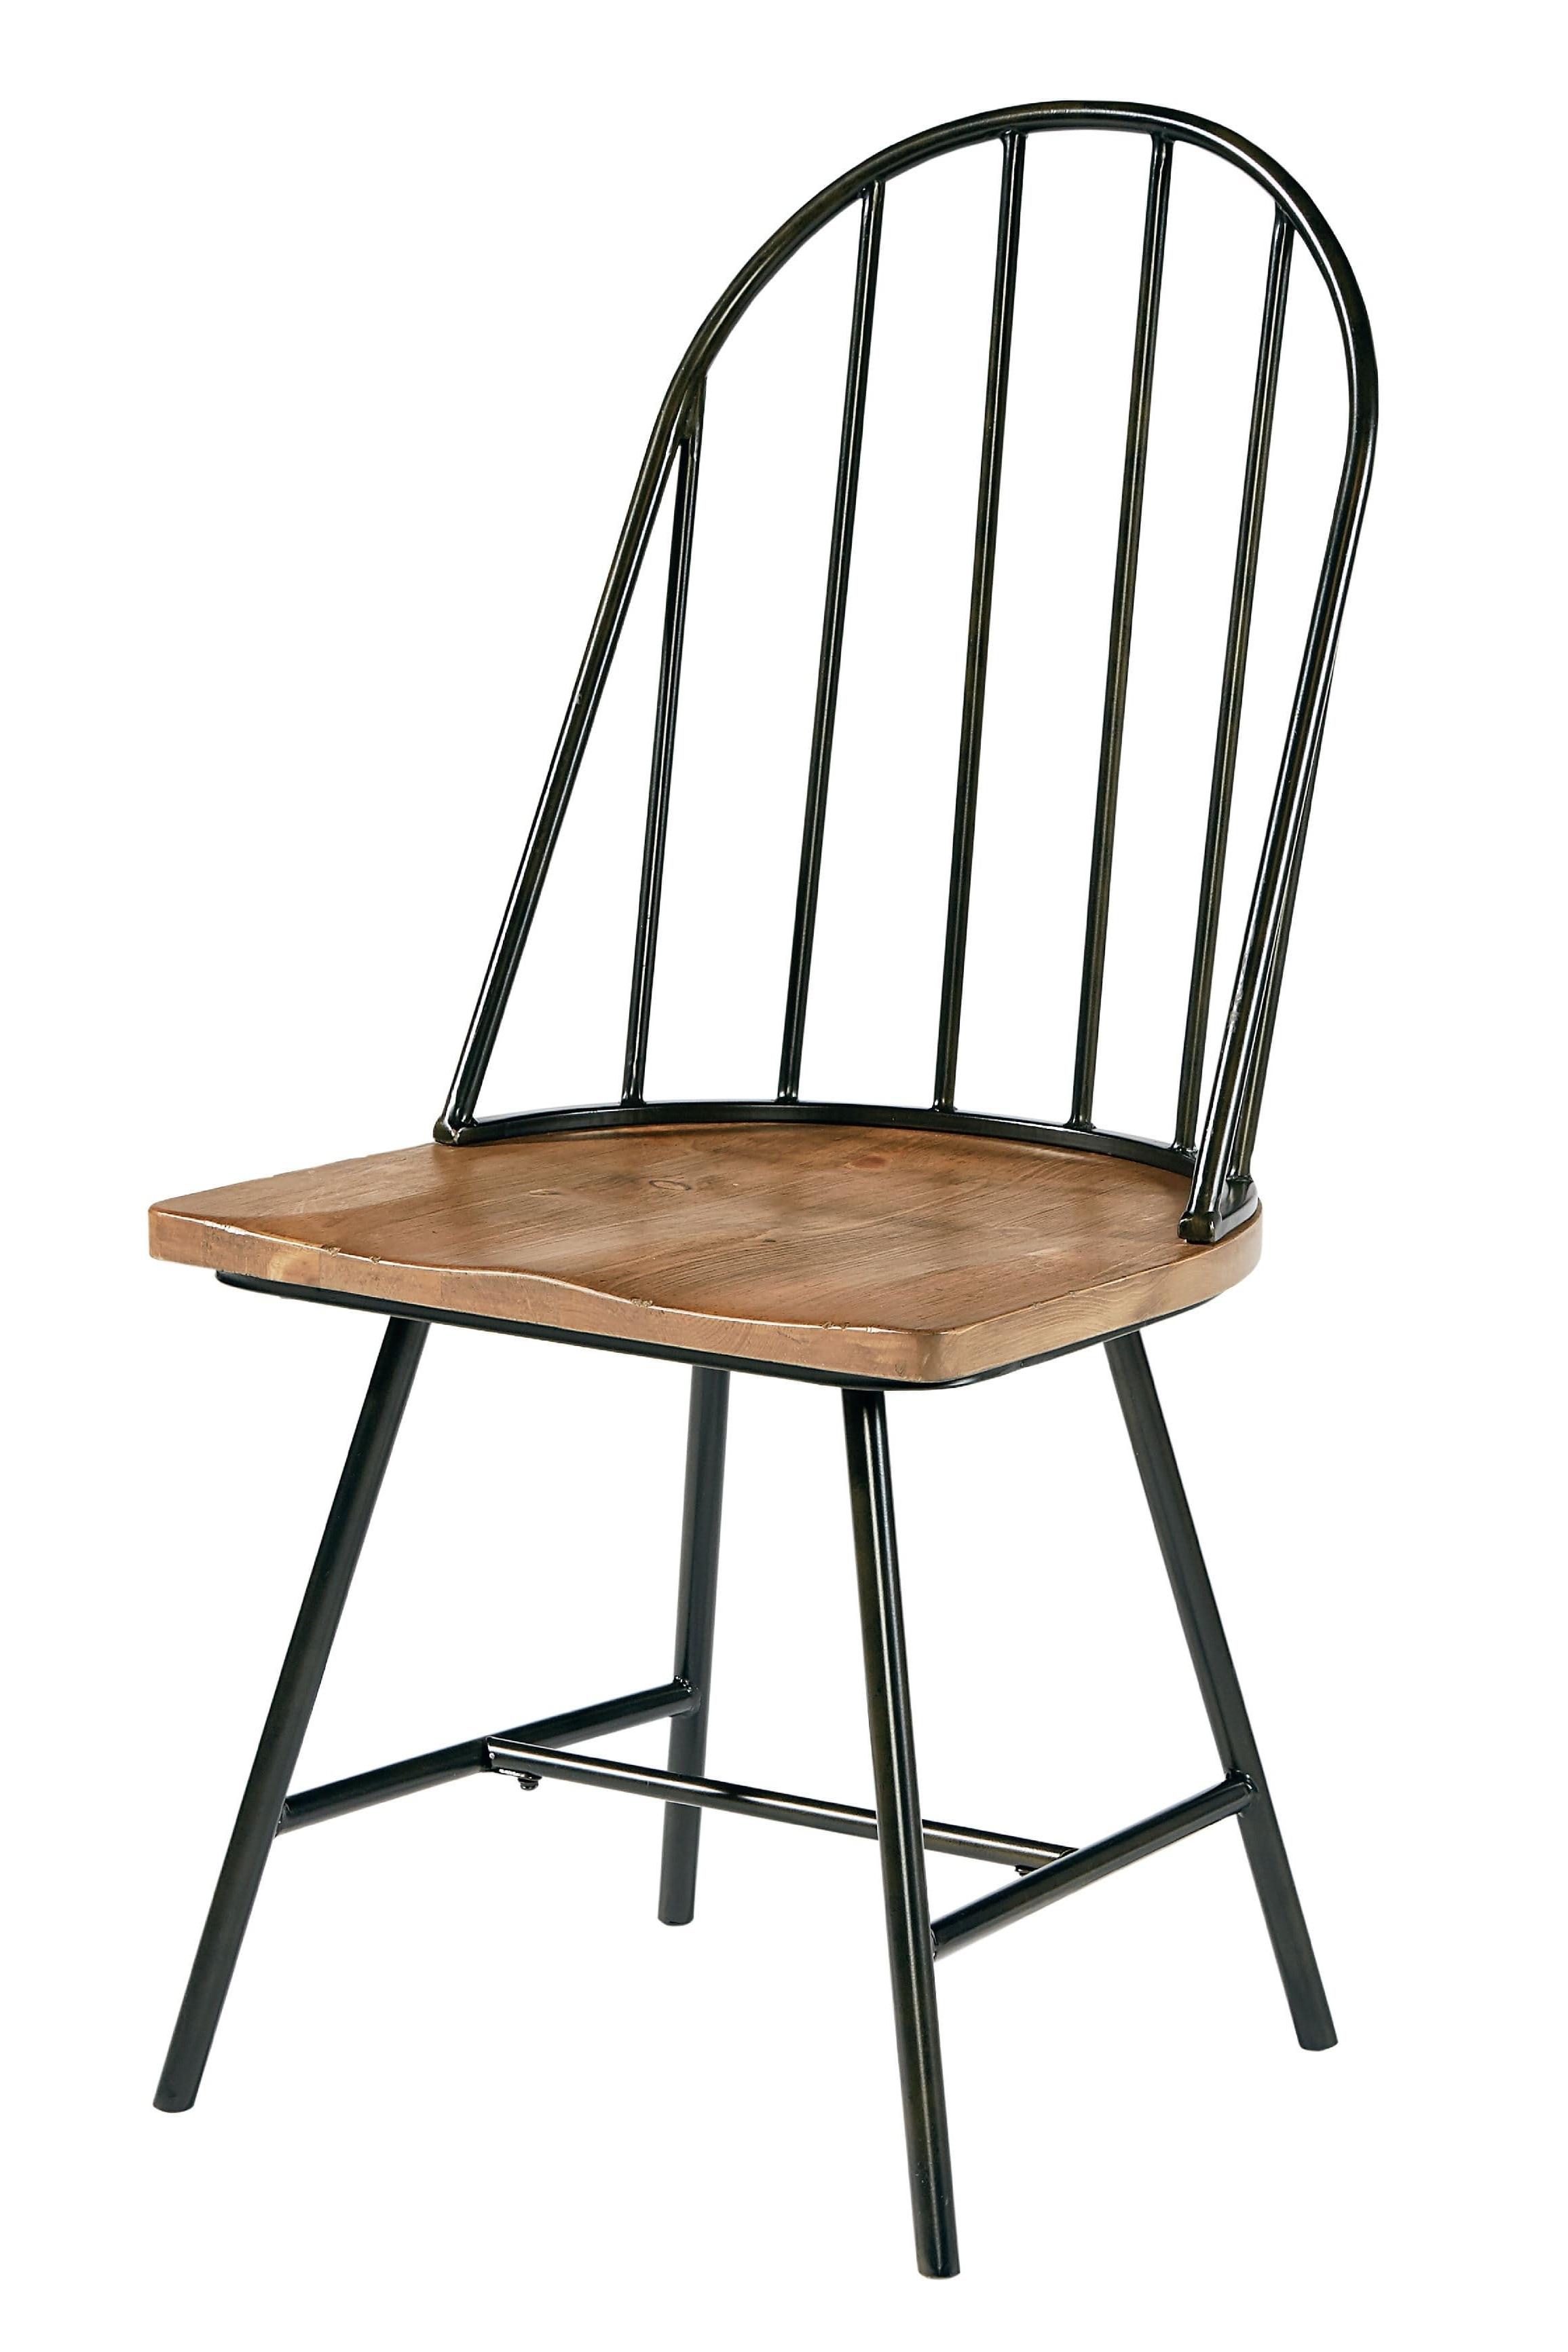 Magnolia Home – Windsor Metal And Wood Hoop Chair St: (View 3 of 20)